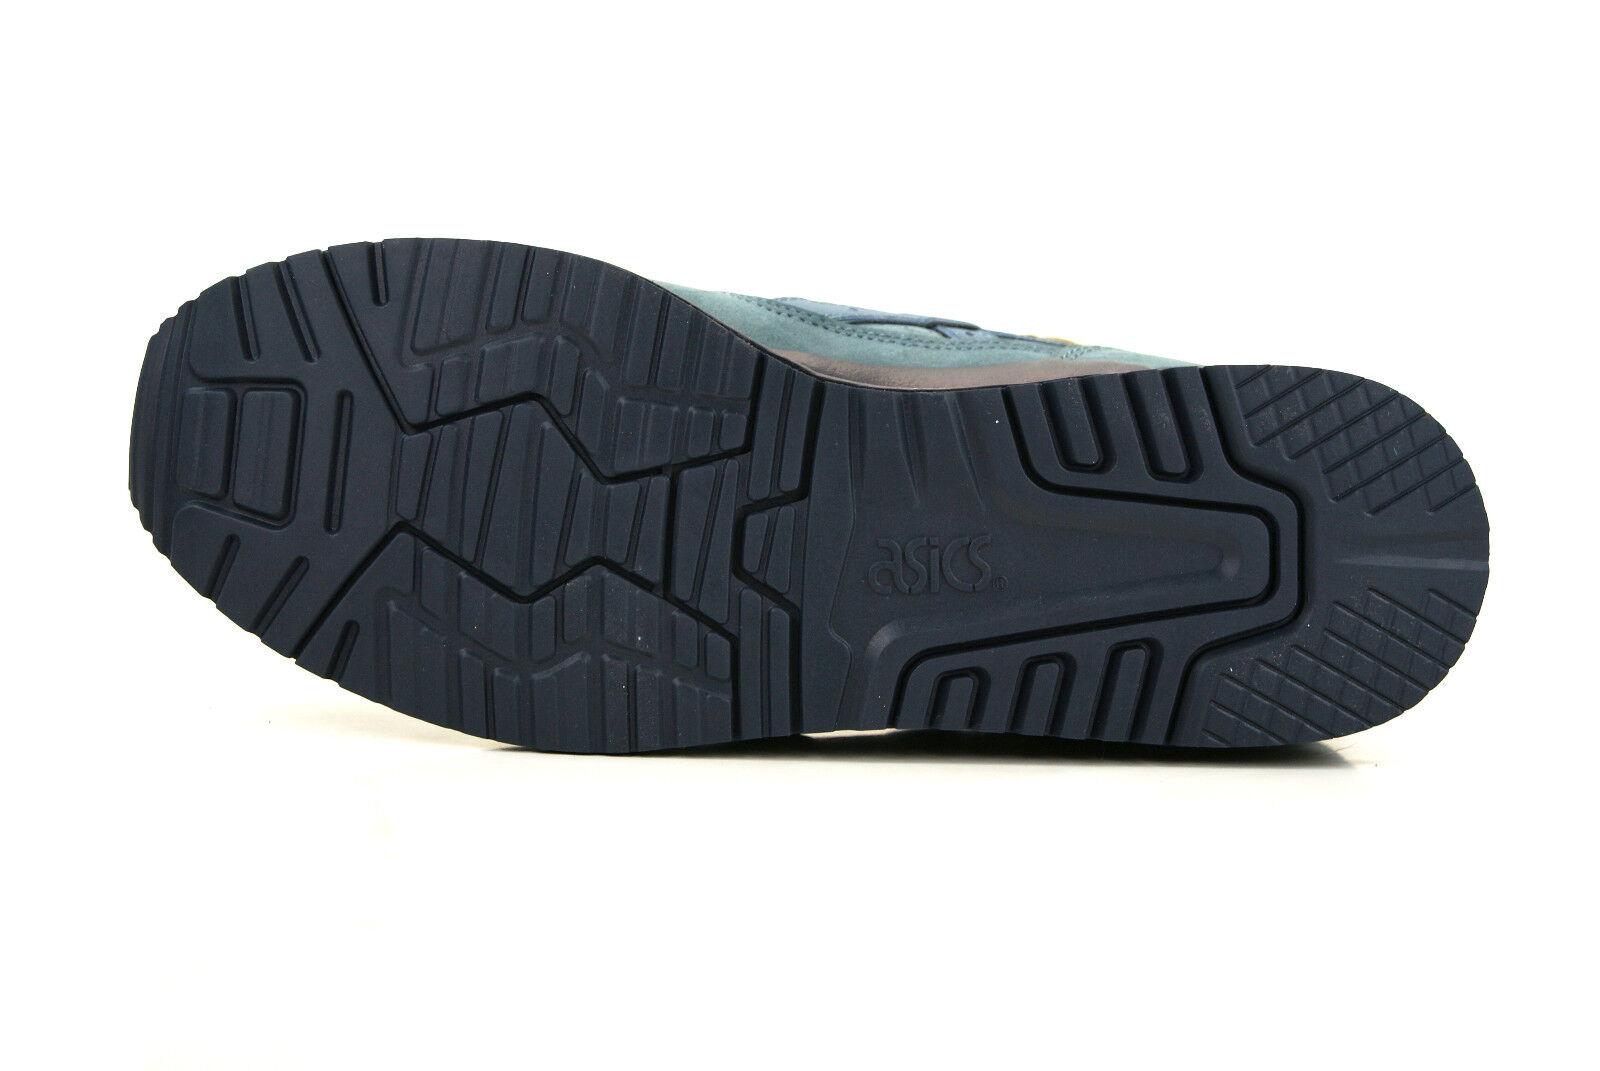 Asics zapatillas gel-Lyte III 3 Moonwalker Pack zapatillas Asics de deporte caballero zapatillas Zapatos señora 2d016b